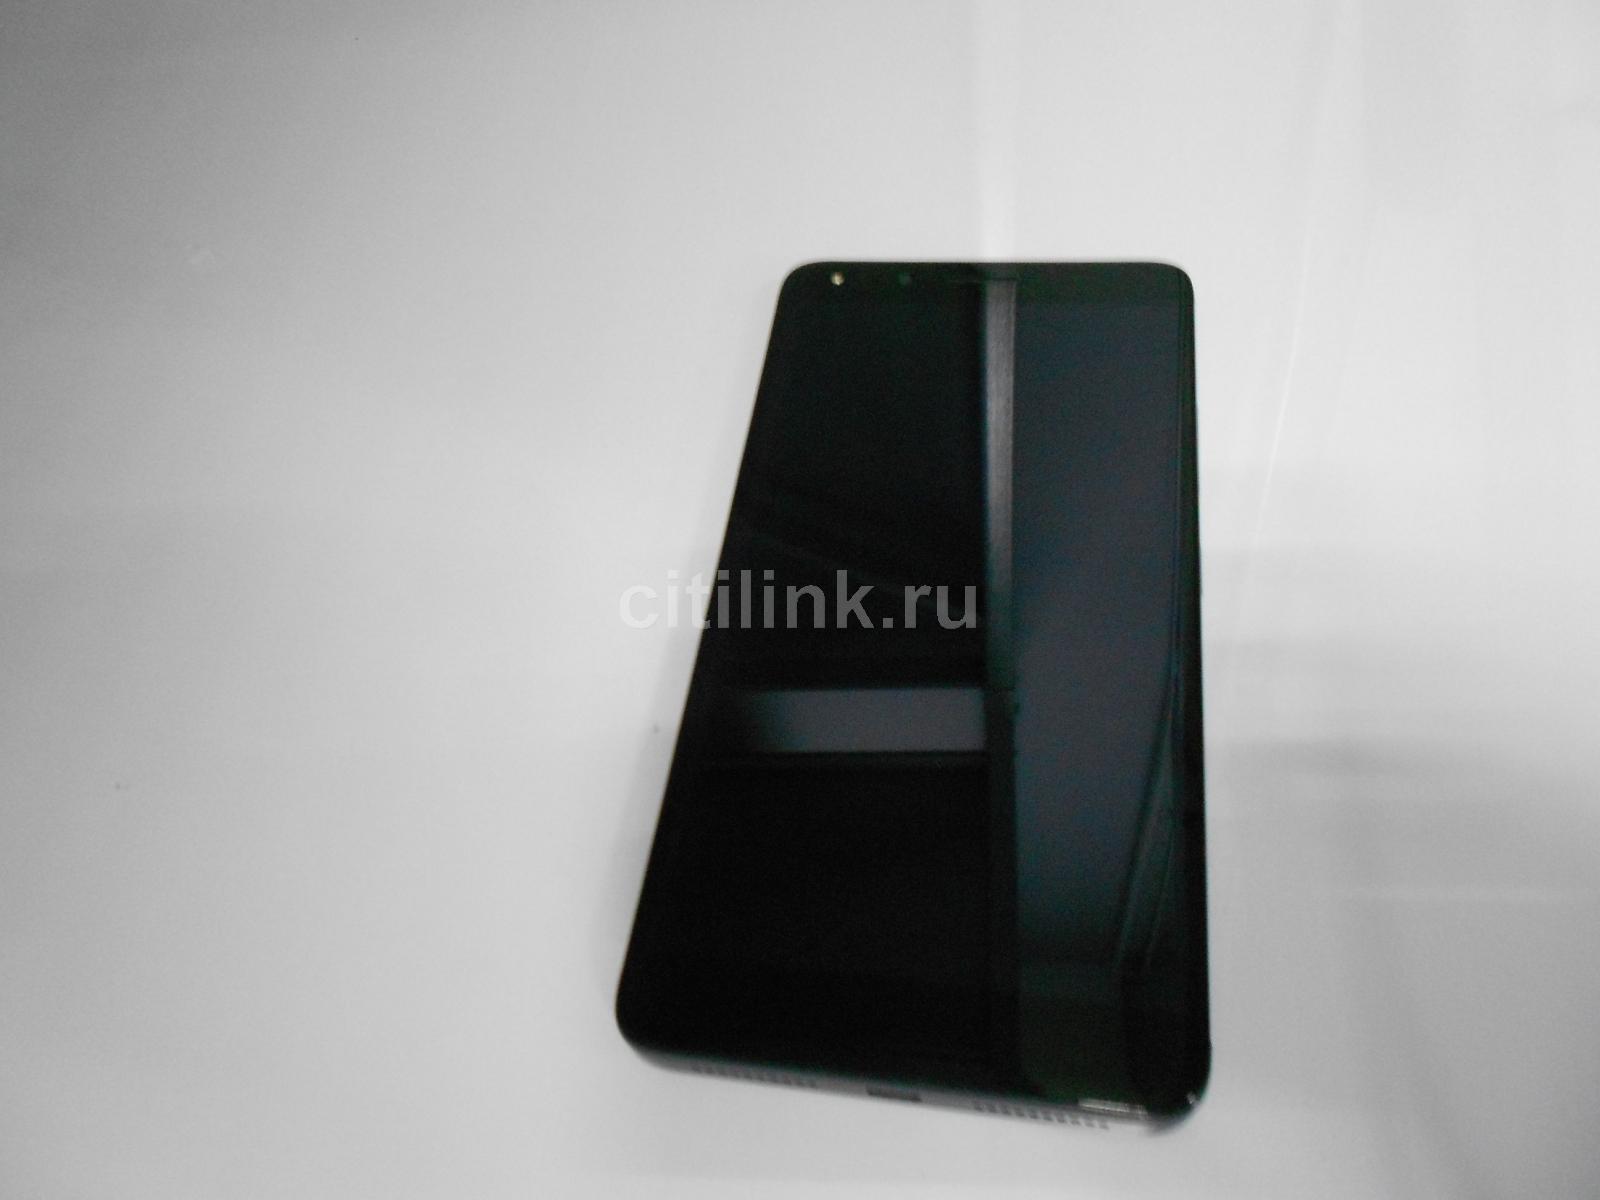 "Смартфон Alcatel Pop 4-6 7070 16Gb 2Gb графит 3G 4G 6.0"" IPS 1080x1920 And6.0 13Mpix WiFi BT GP(Б/У)"